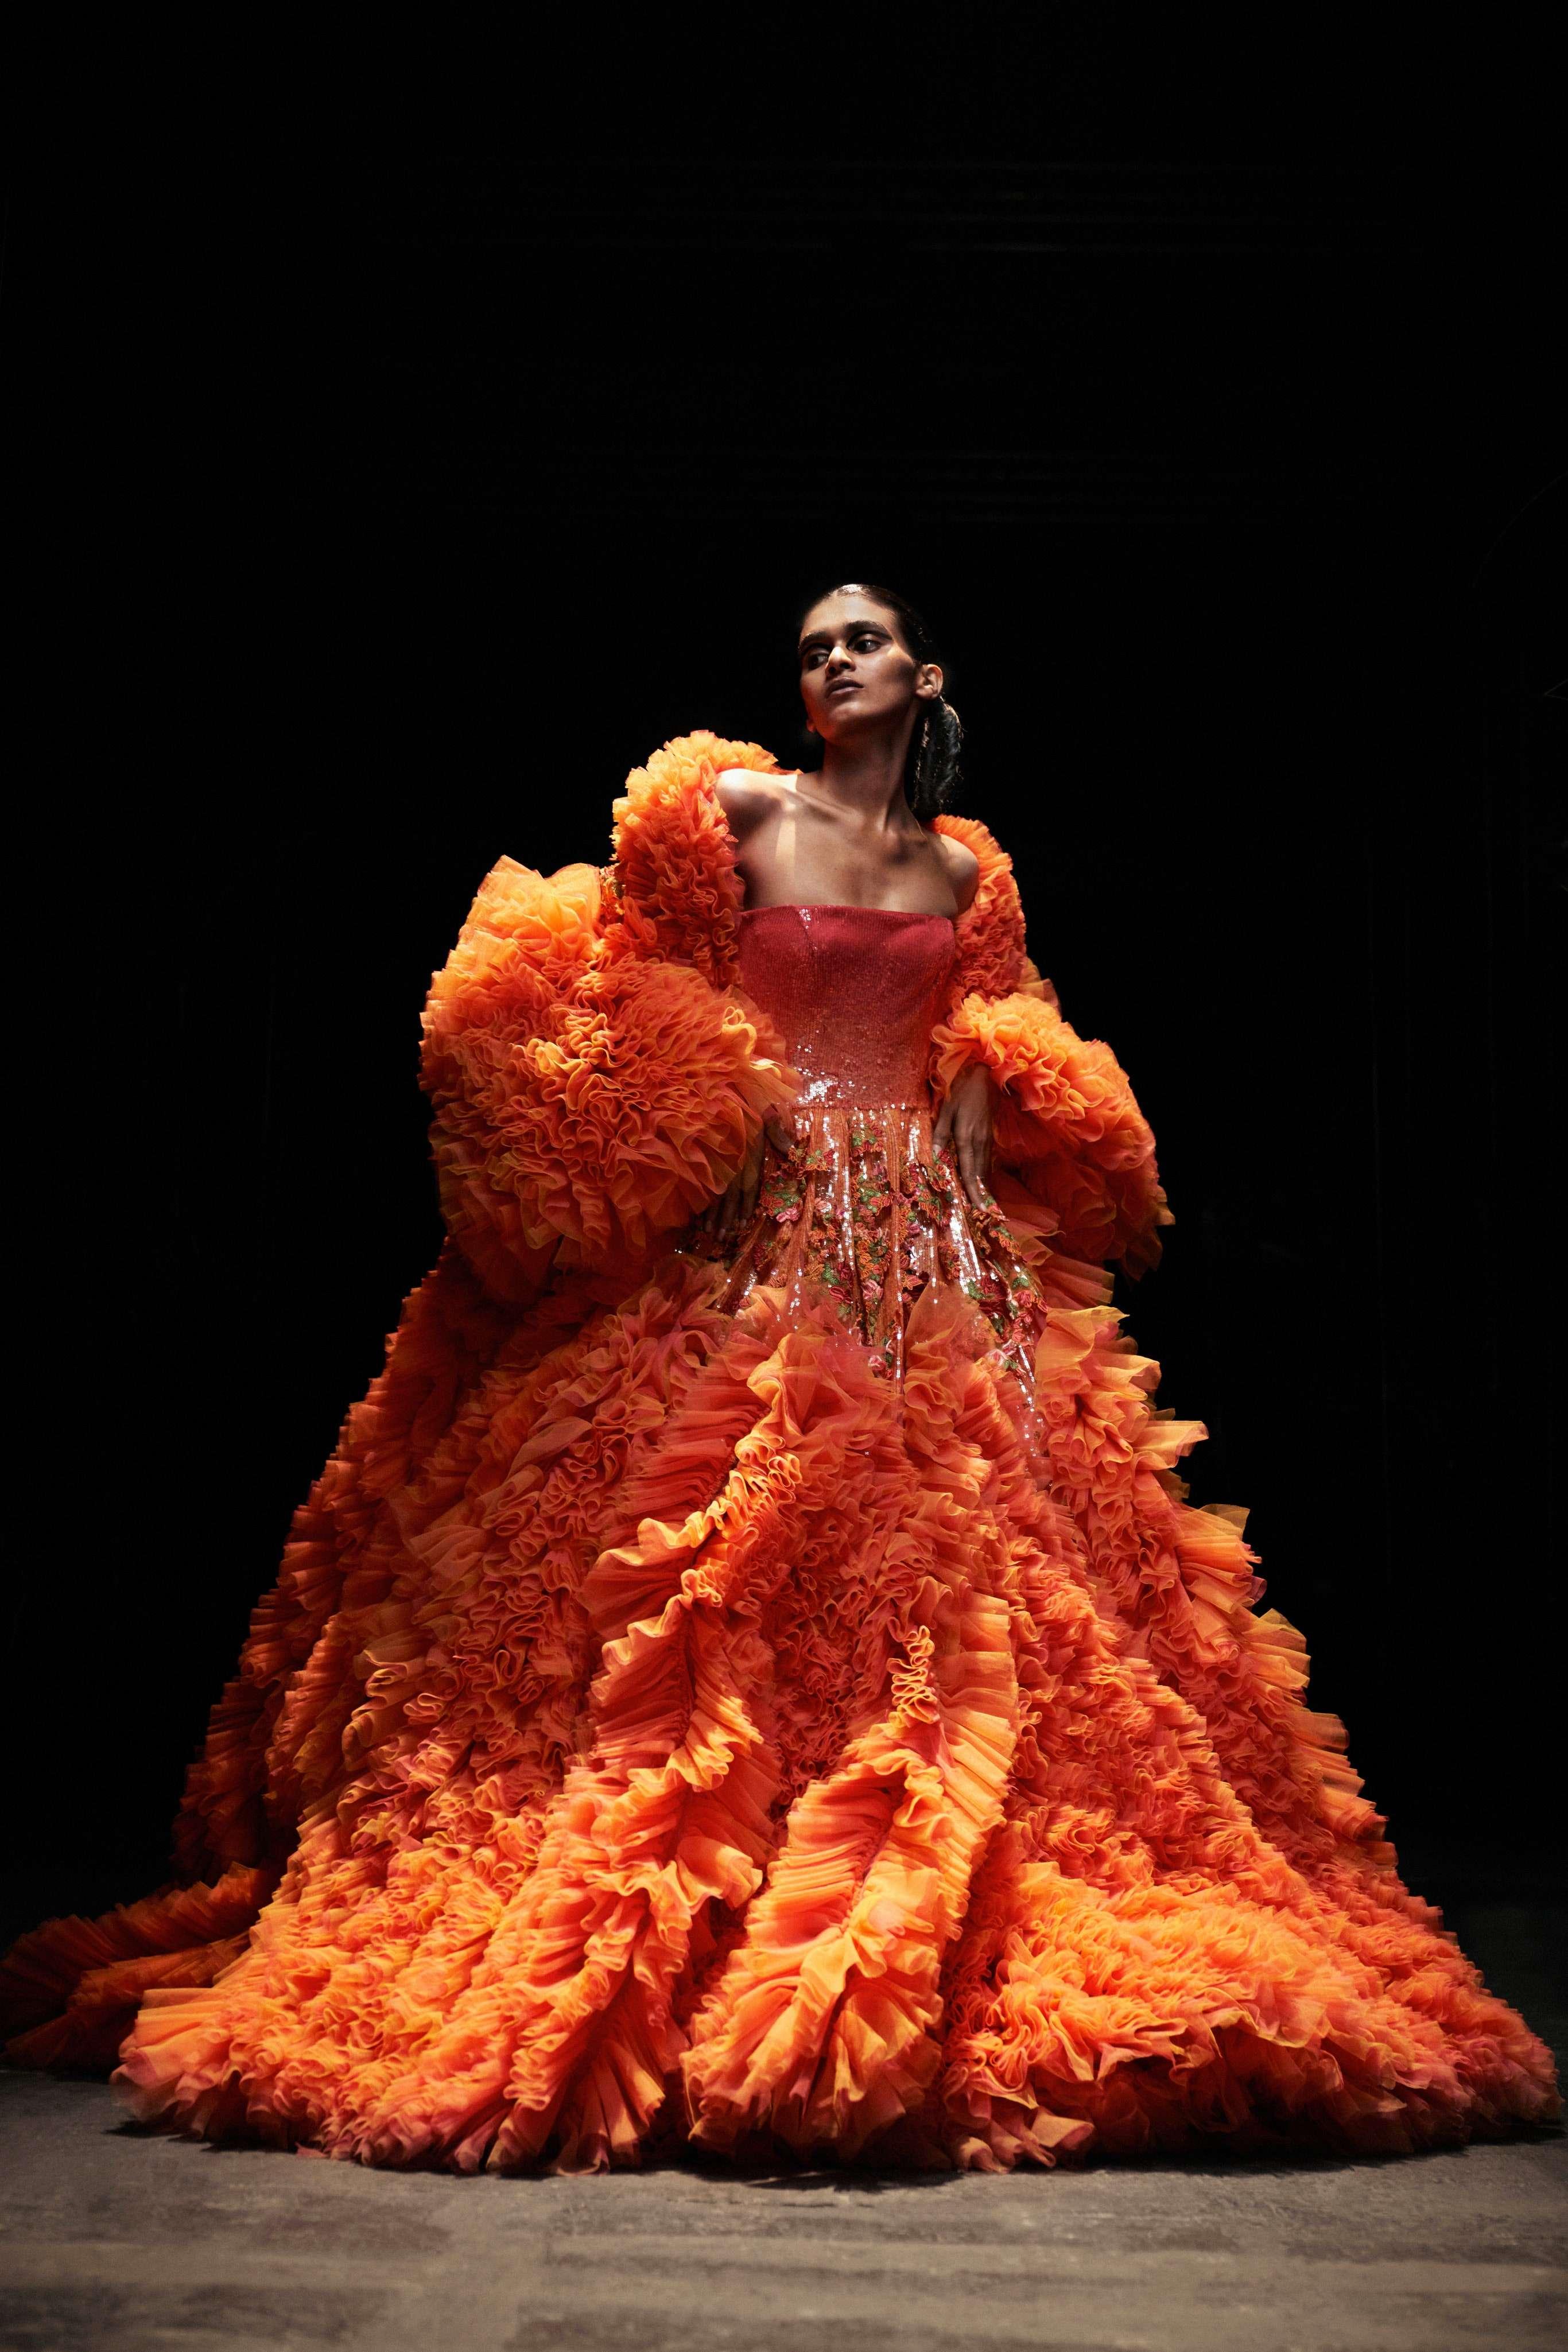 00022-Rahul-Mishra-Couture-Fall-21-credit-brand